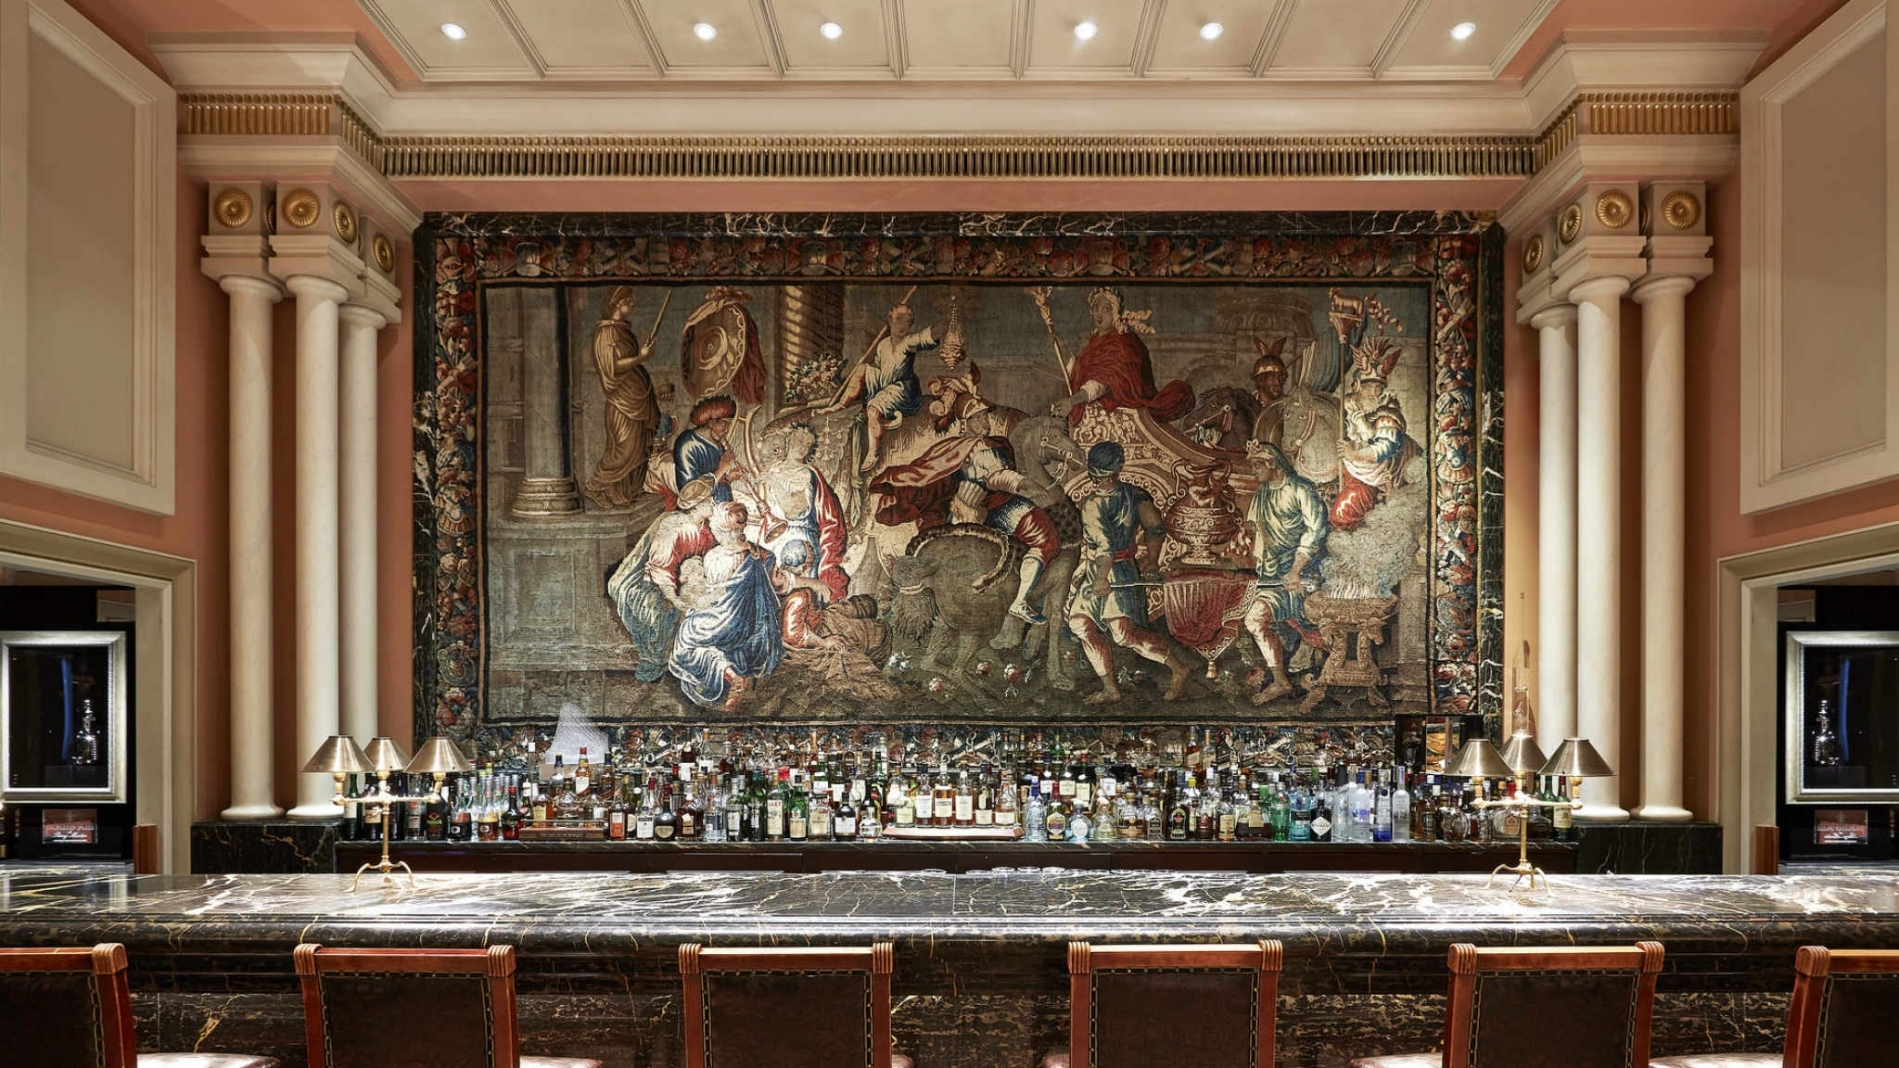 alexanders-bar-hotel-grande-bretagne-athens-signature-drinks-and-cocktails-bar-menu-sophisticated